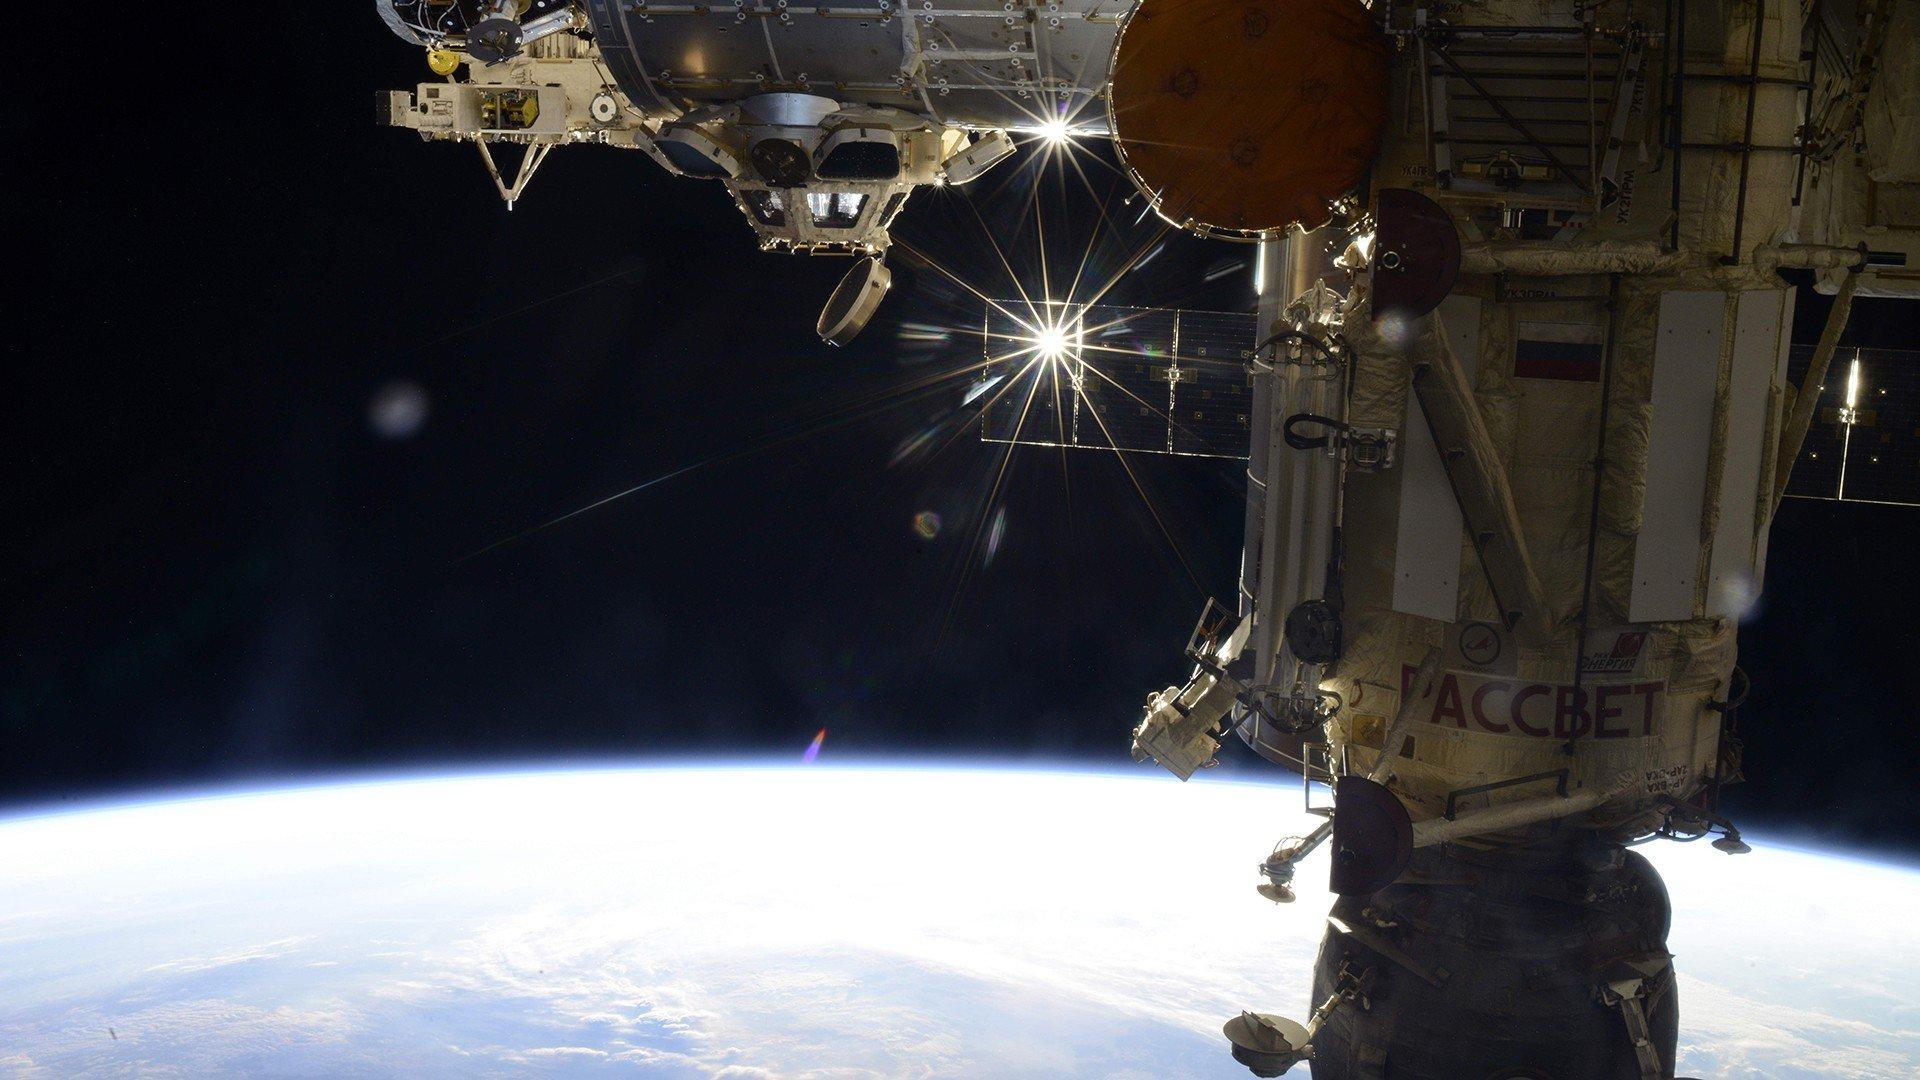 Roscosmos nasa international space station hd wallpapers - Space station wallpaper ...